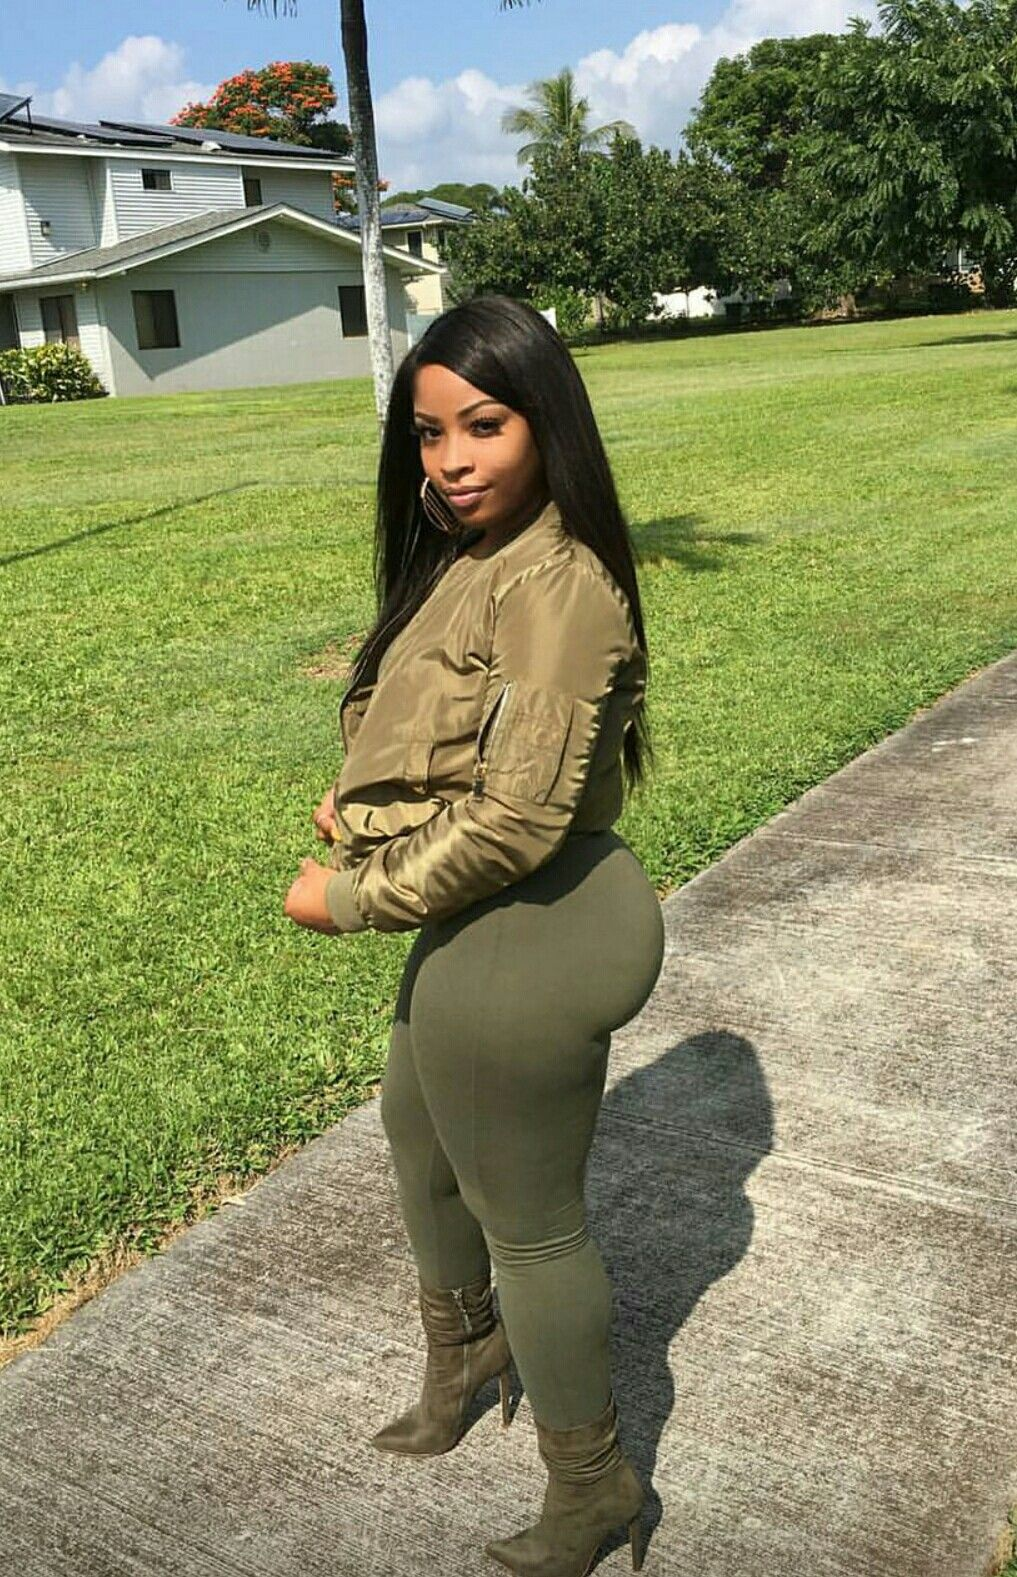 böse schwarze Mädchen com